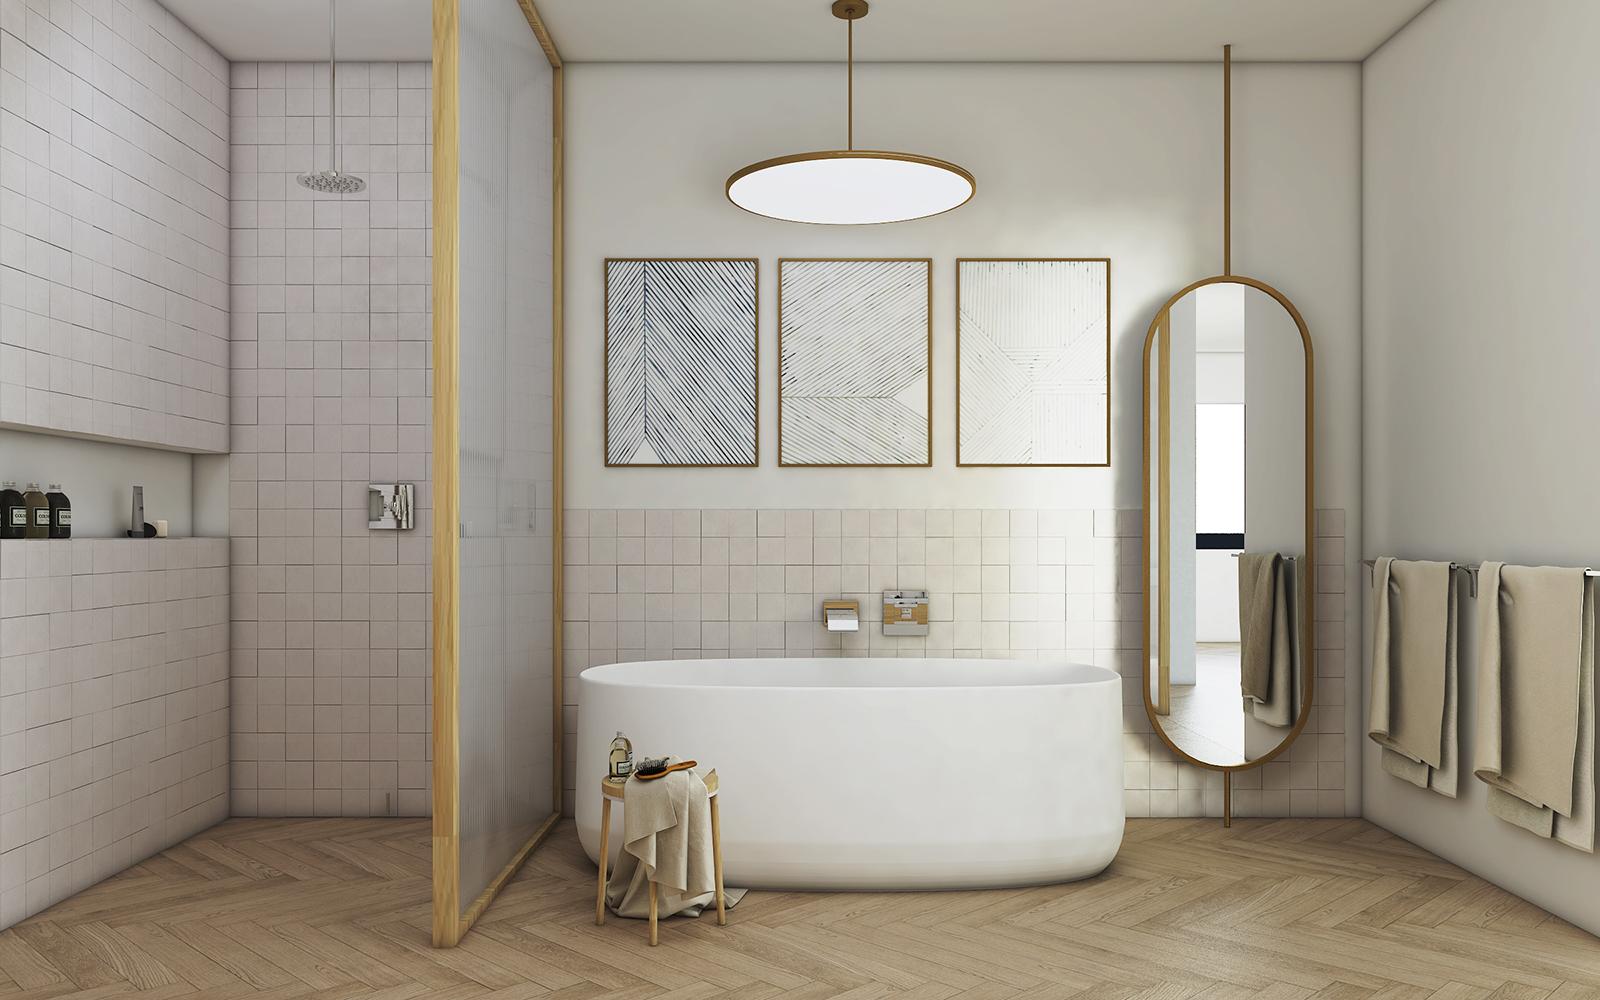 Kohler Bathroom Competition View 2 [Proof1].jpg